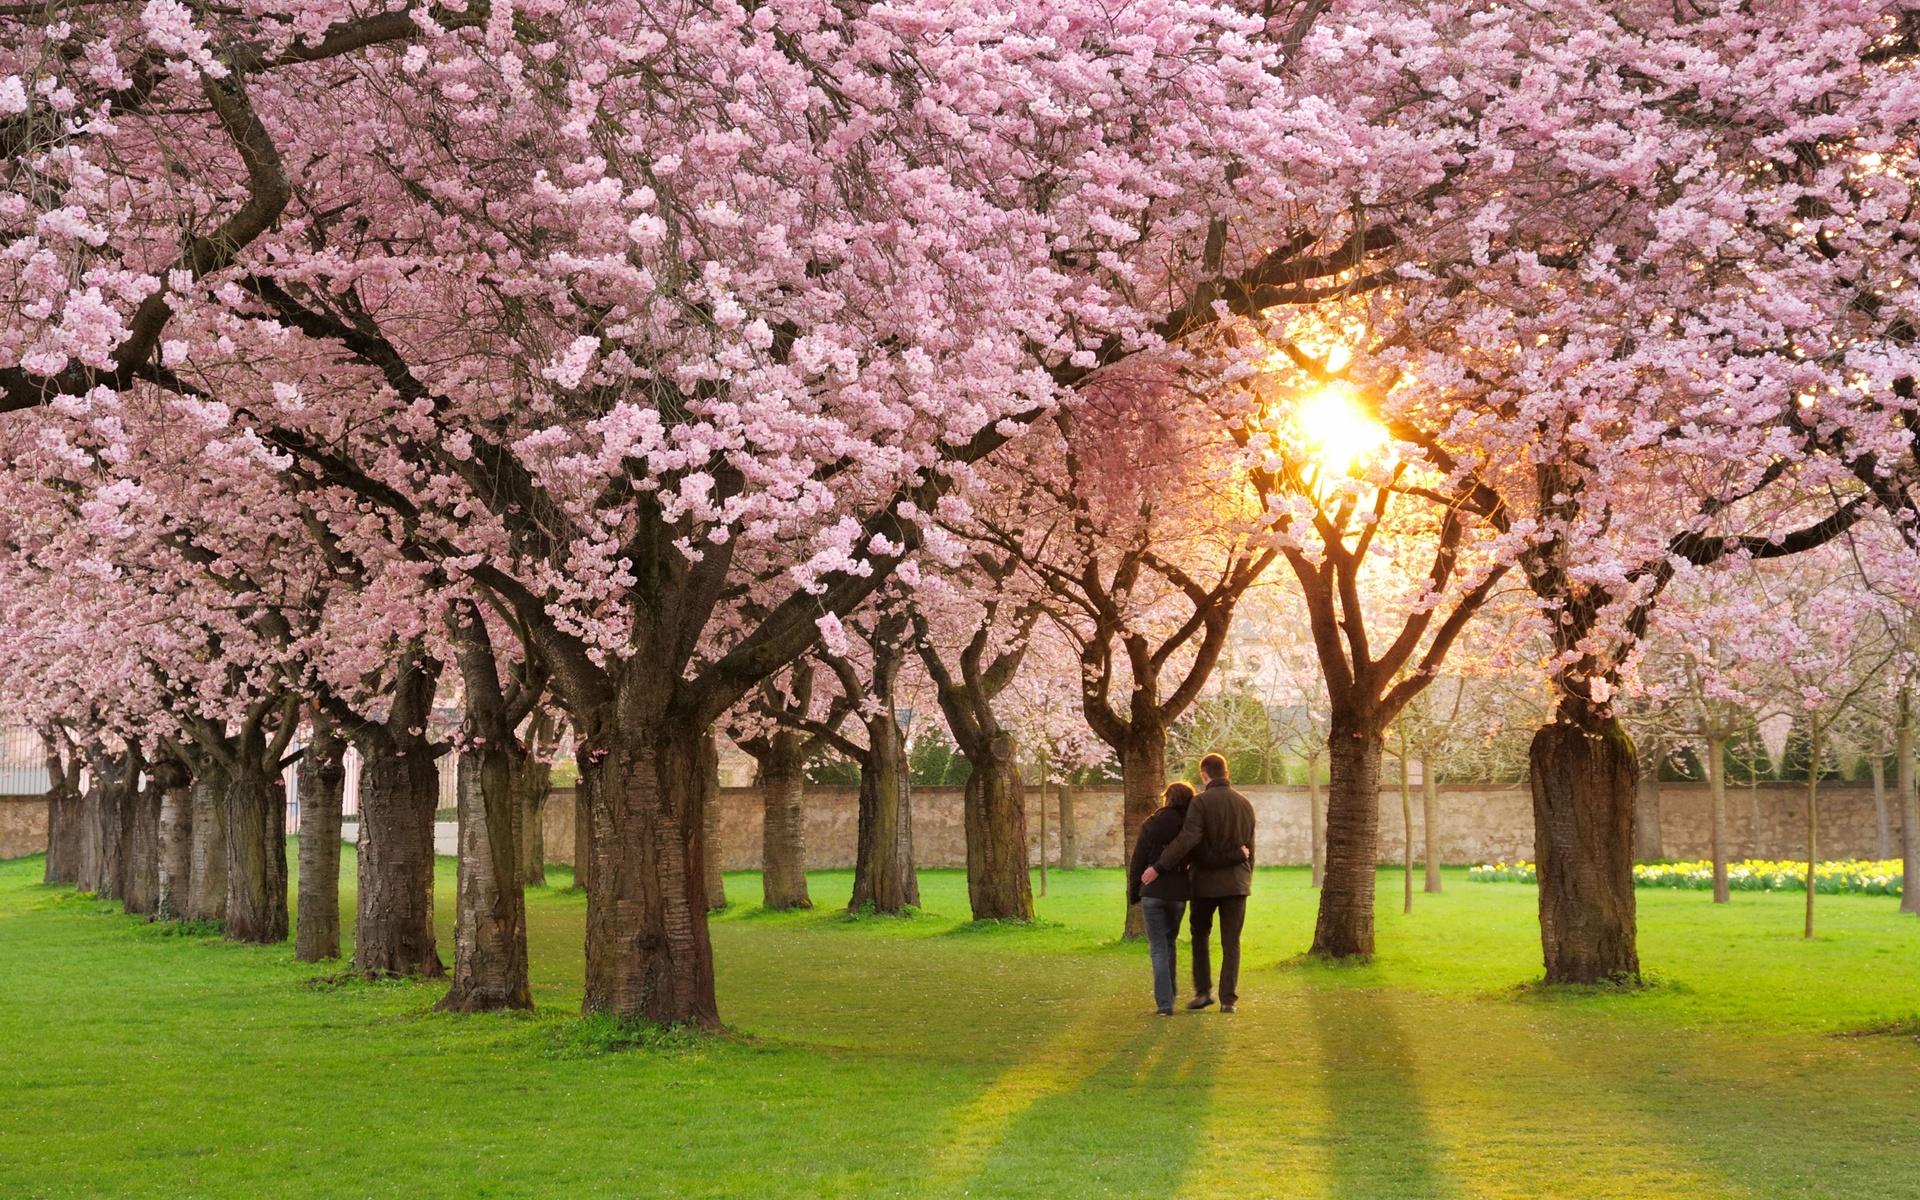 сакура, весна, люди, любовь